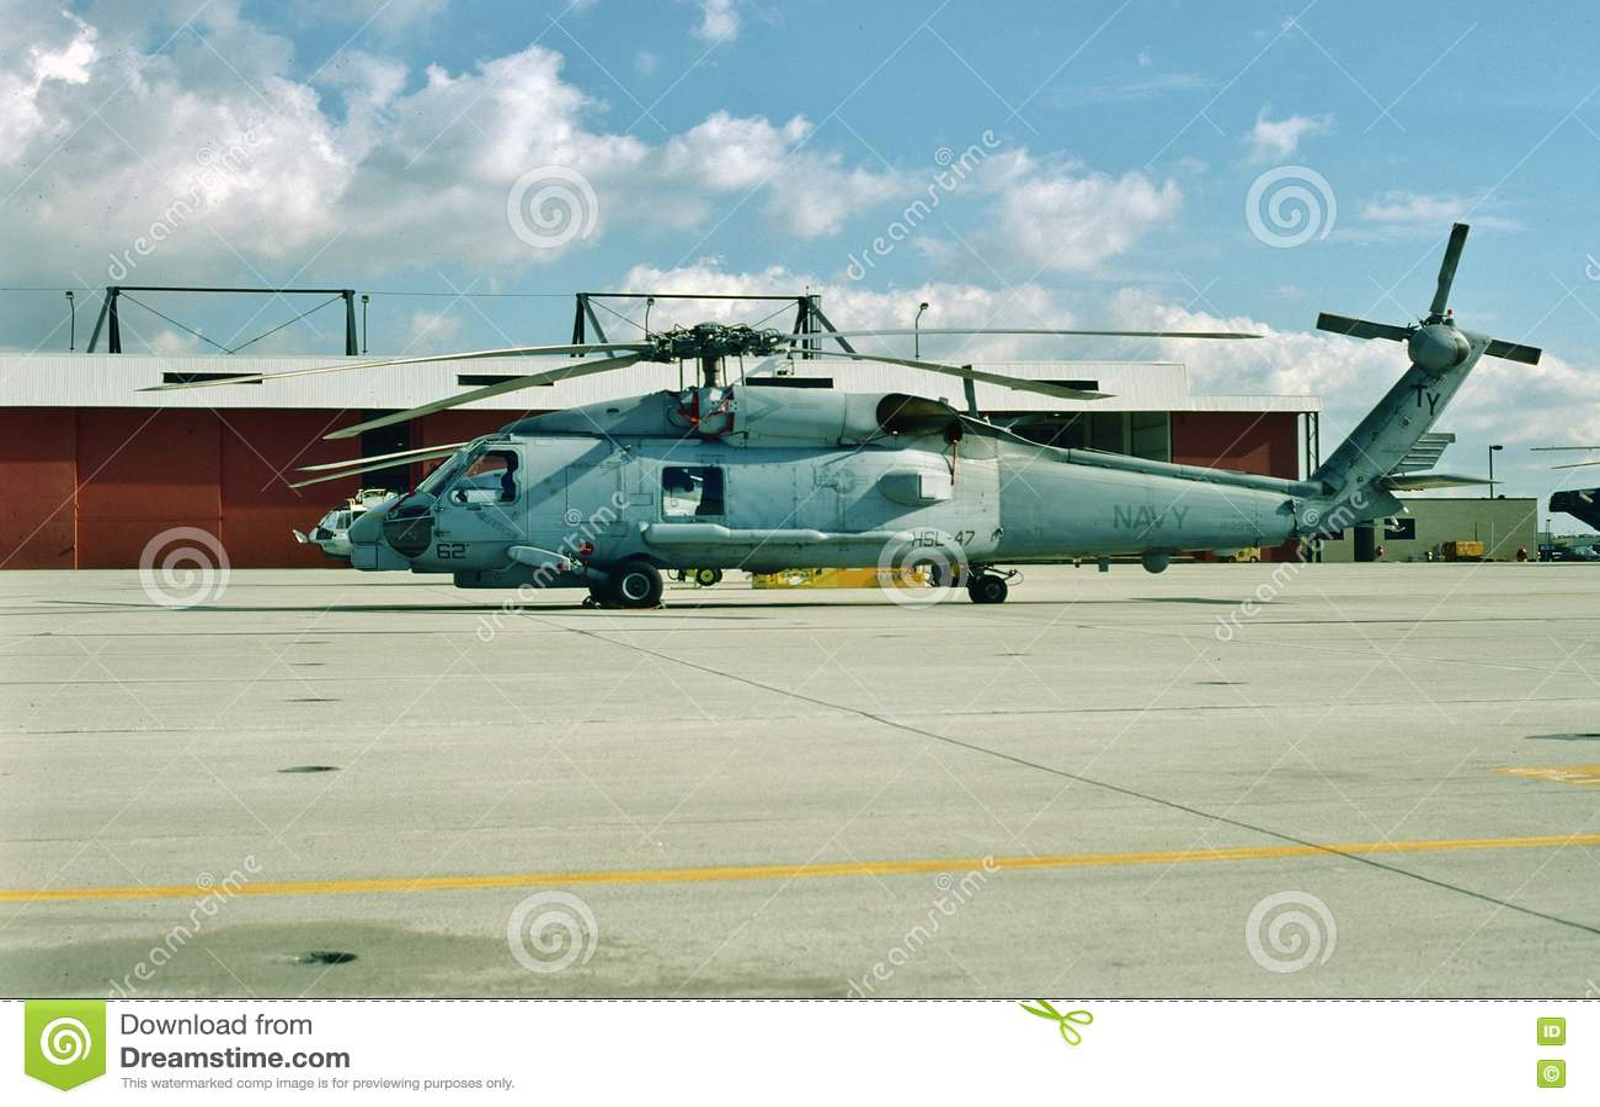 Вертолет USN Sikorsky SH-60B Seahawk